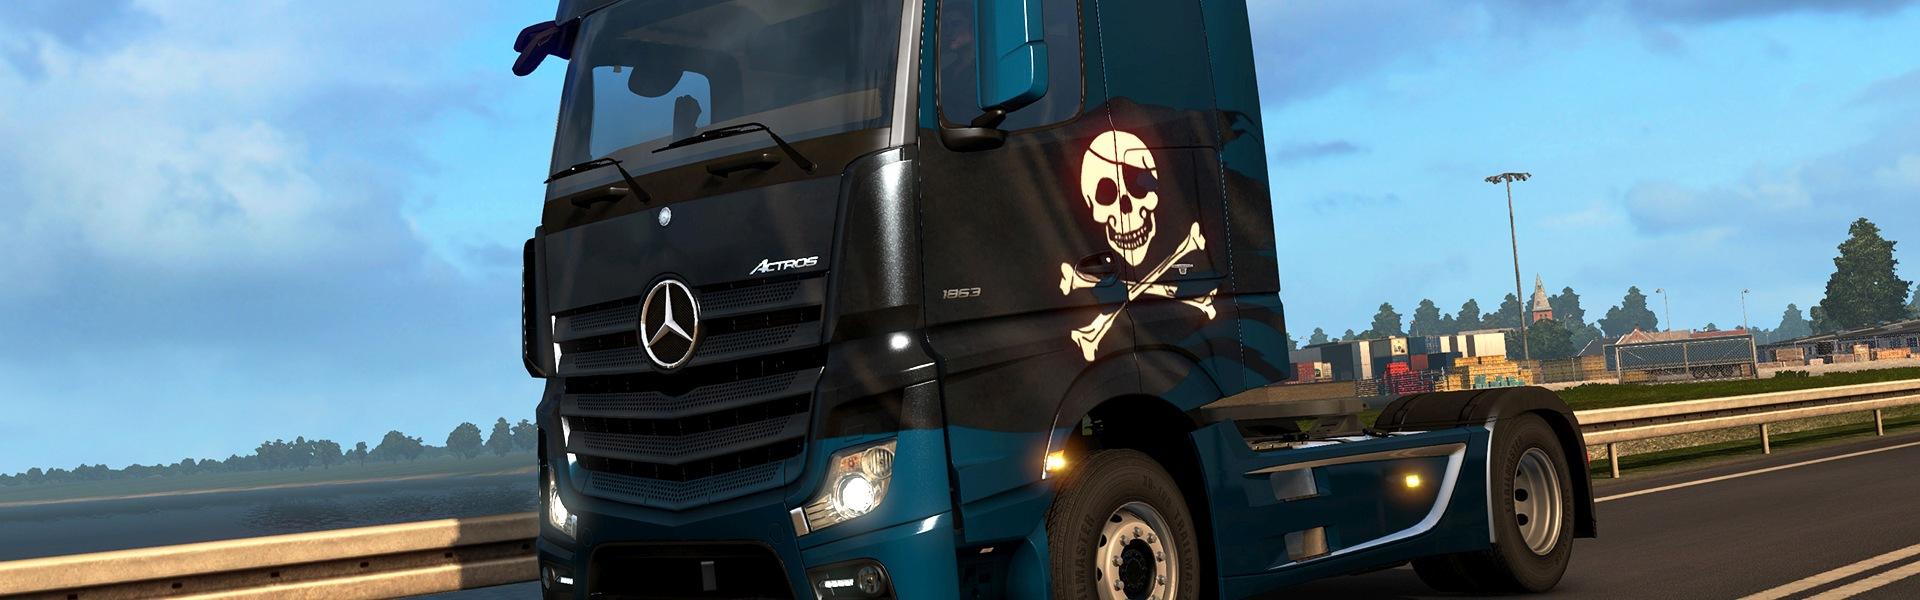 Euro Truck Simulator 2 - Pirate Paint Jobs Pack (DLC) Steam Key GLOBAL